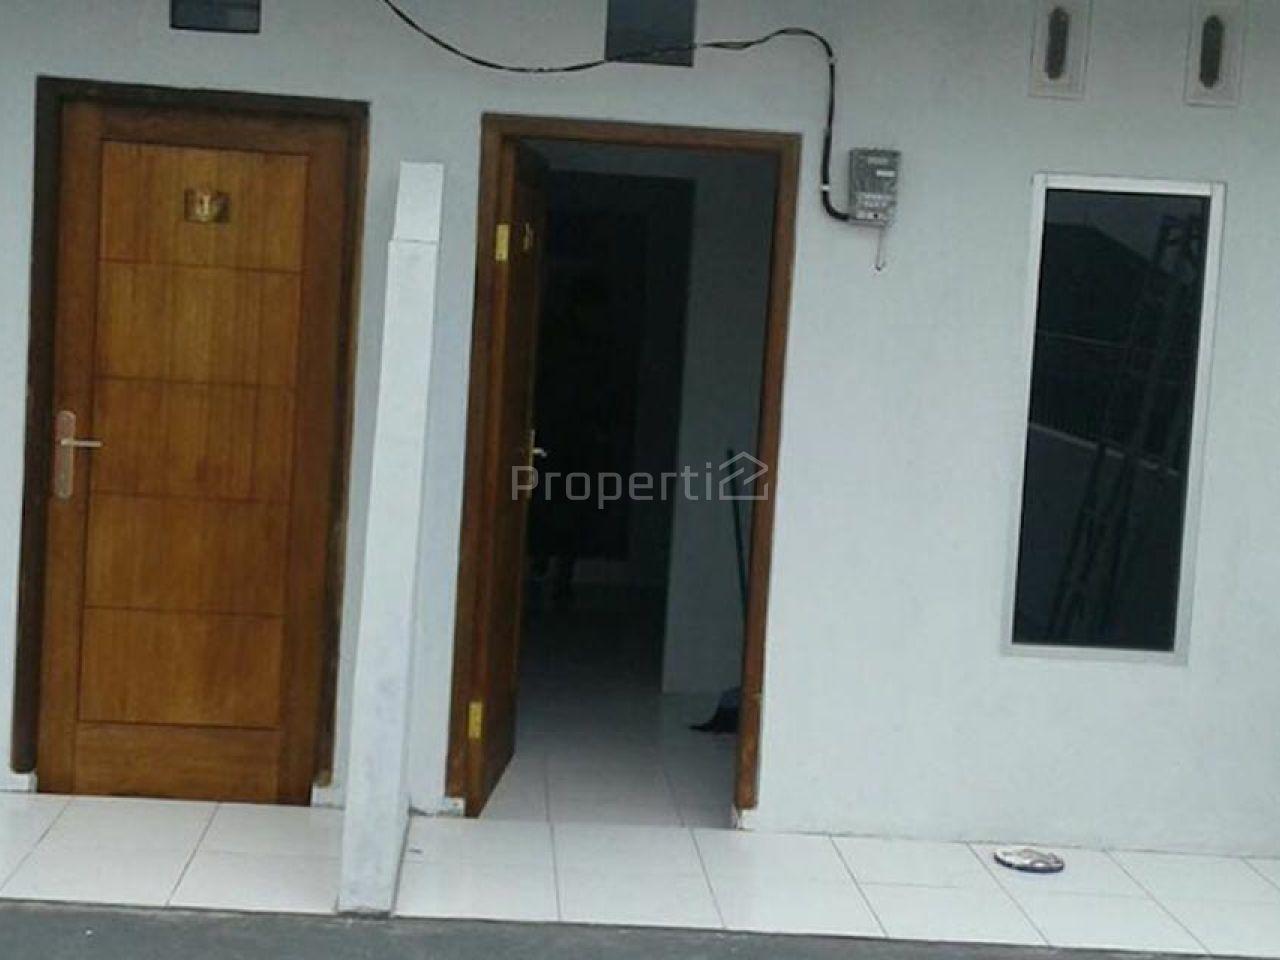 Rumah Kost 3 Lantai di Koja, Jakarta Utara